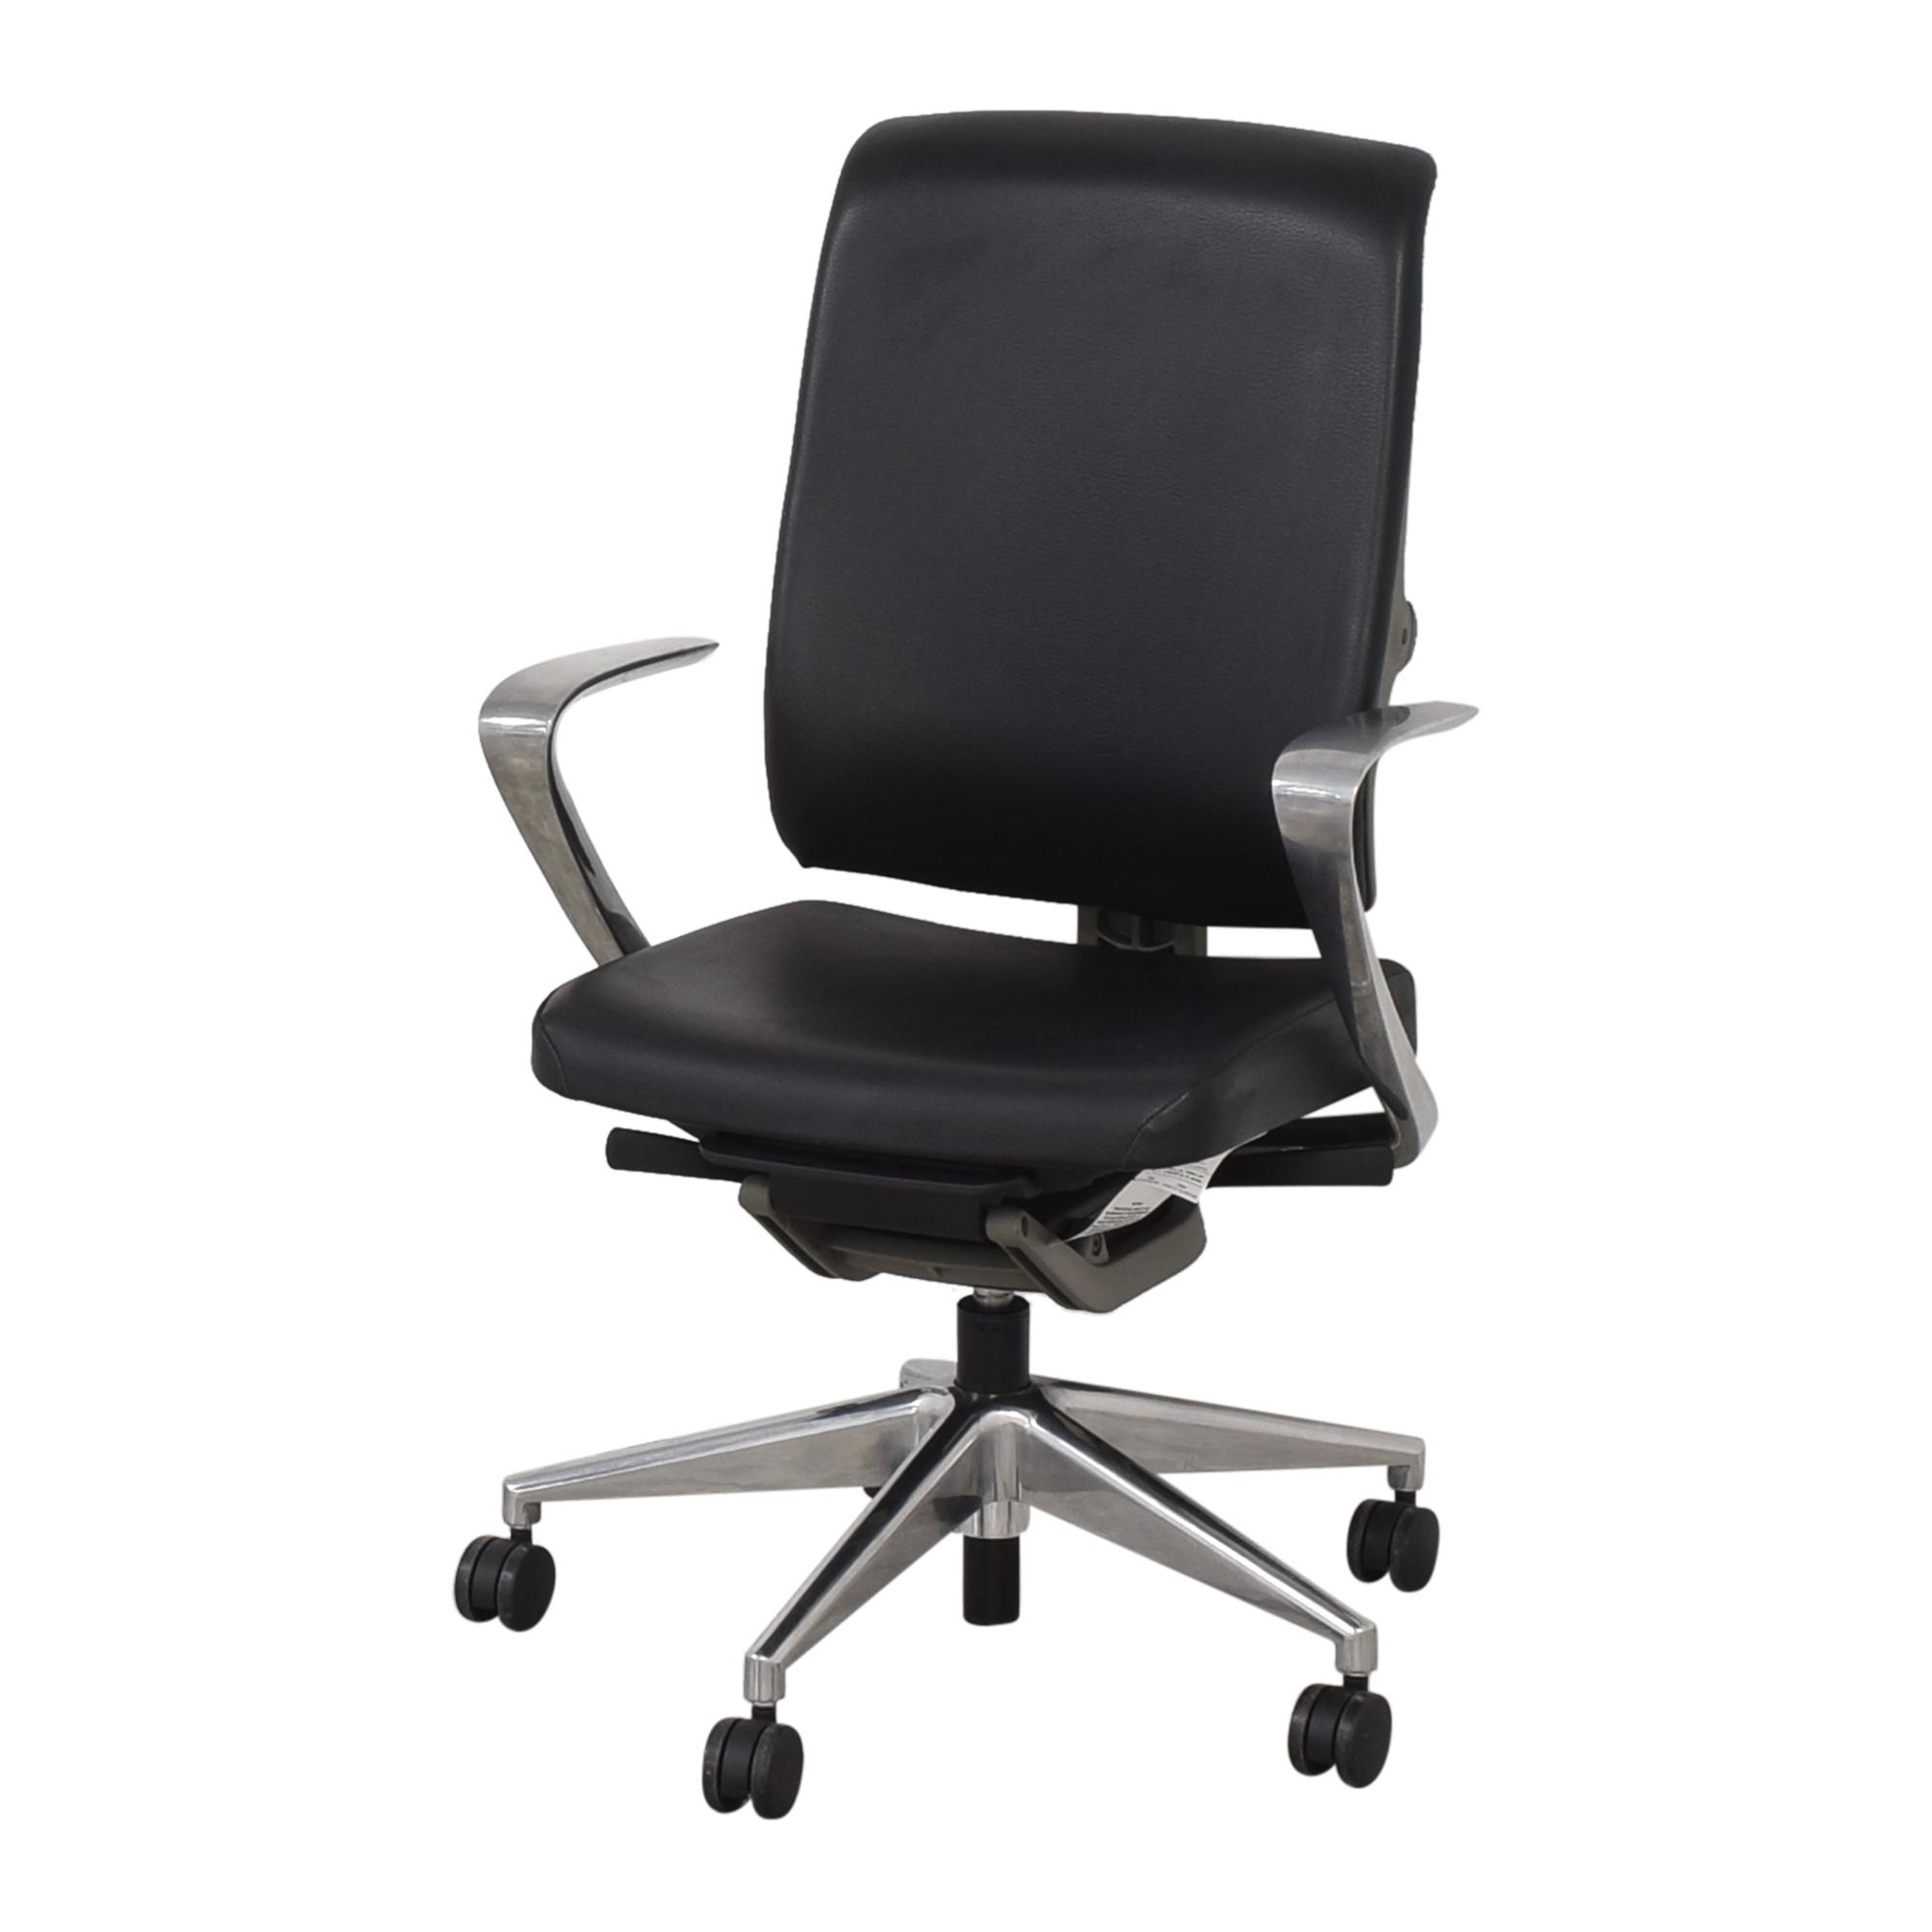 Allsteel Allsteel Task Chair black & silver